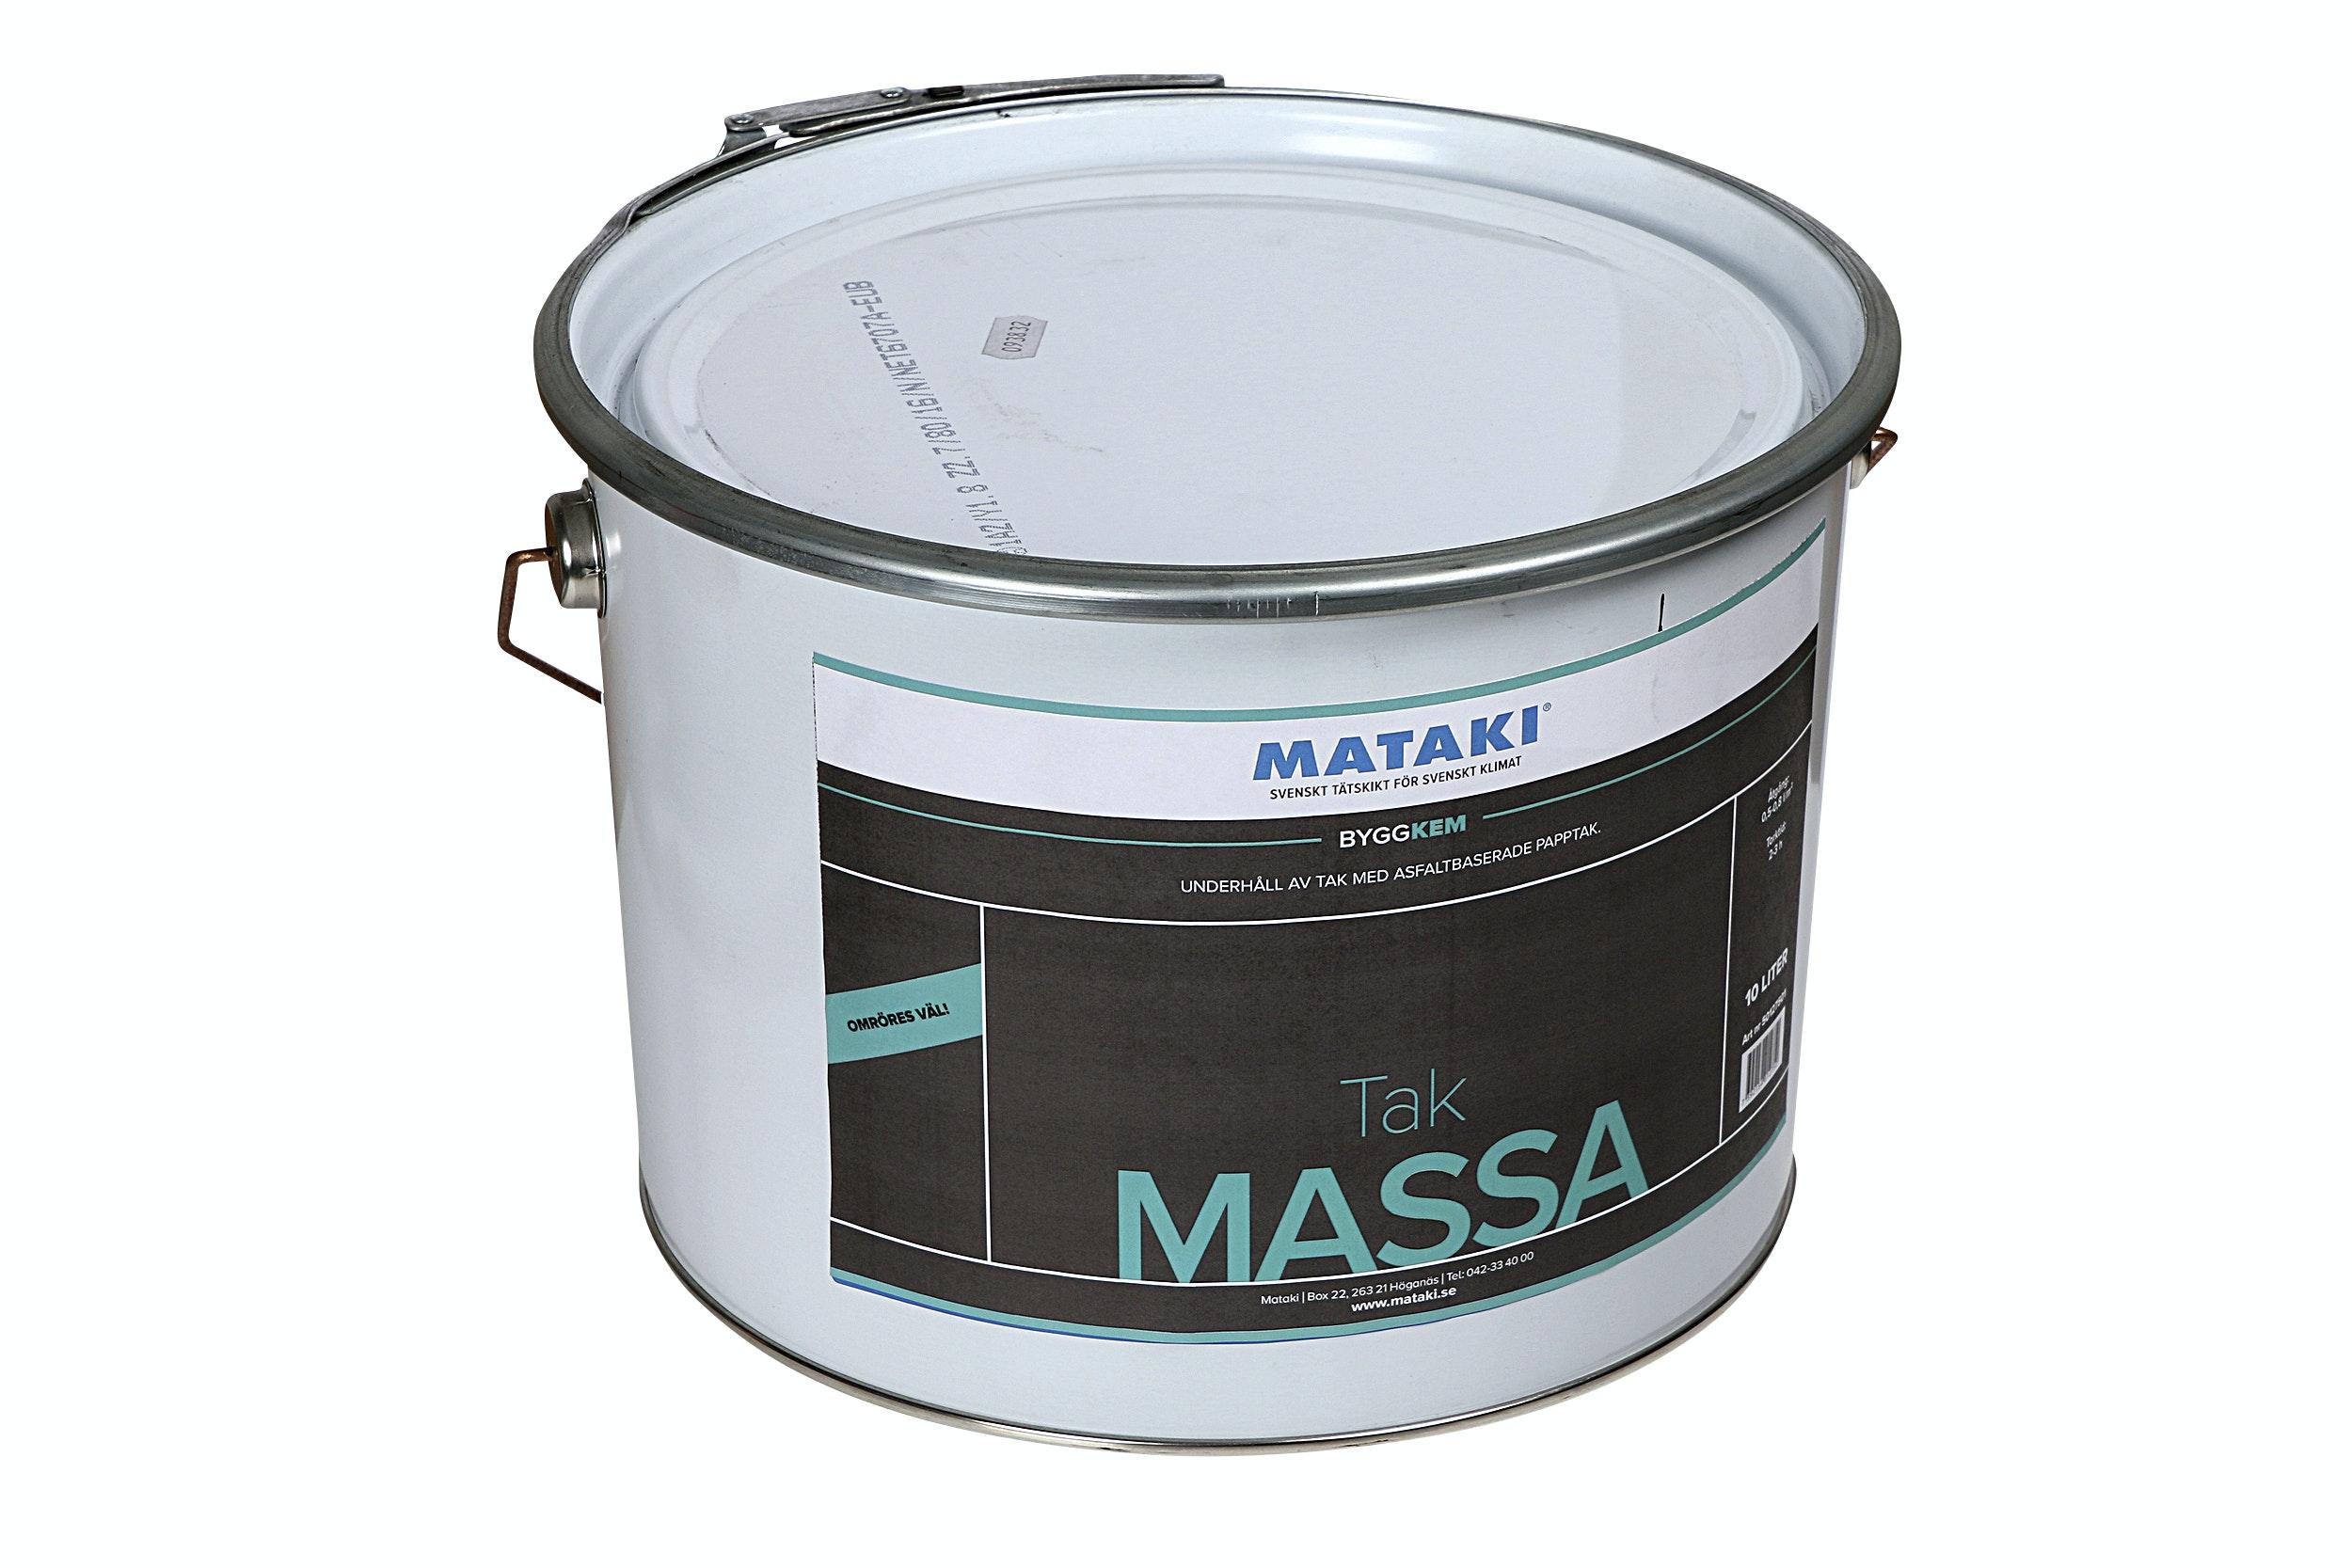 Takmassa 10 liter Mataki